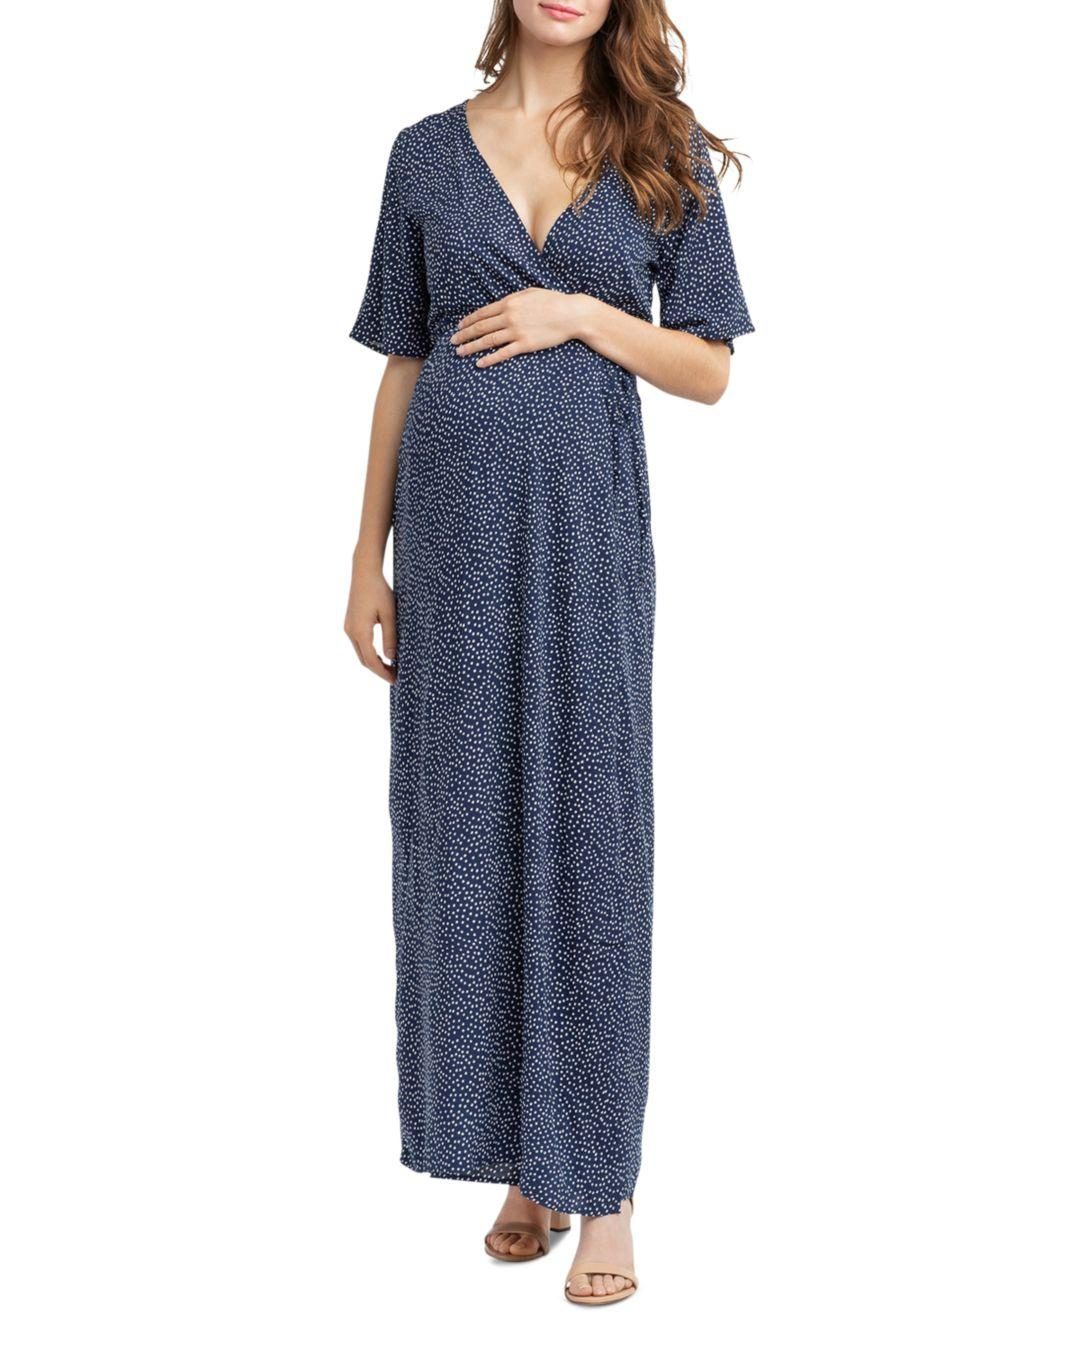 5f50c570deed1 Lyst - Nom Maternity Landon Maxi Nursing Dress in Blue